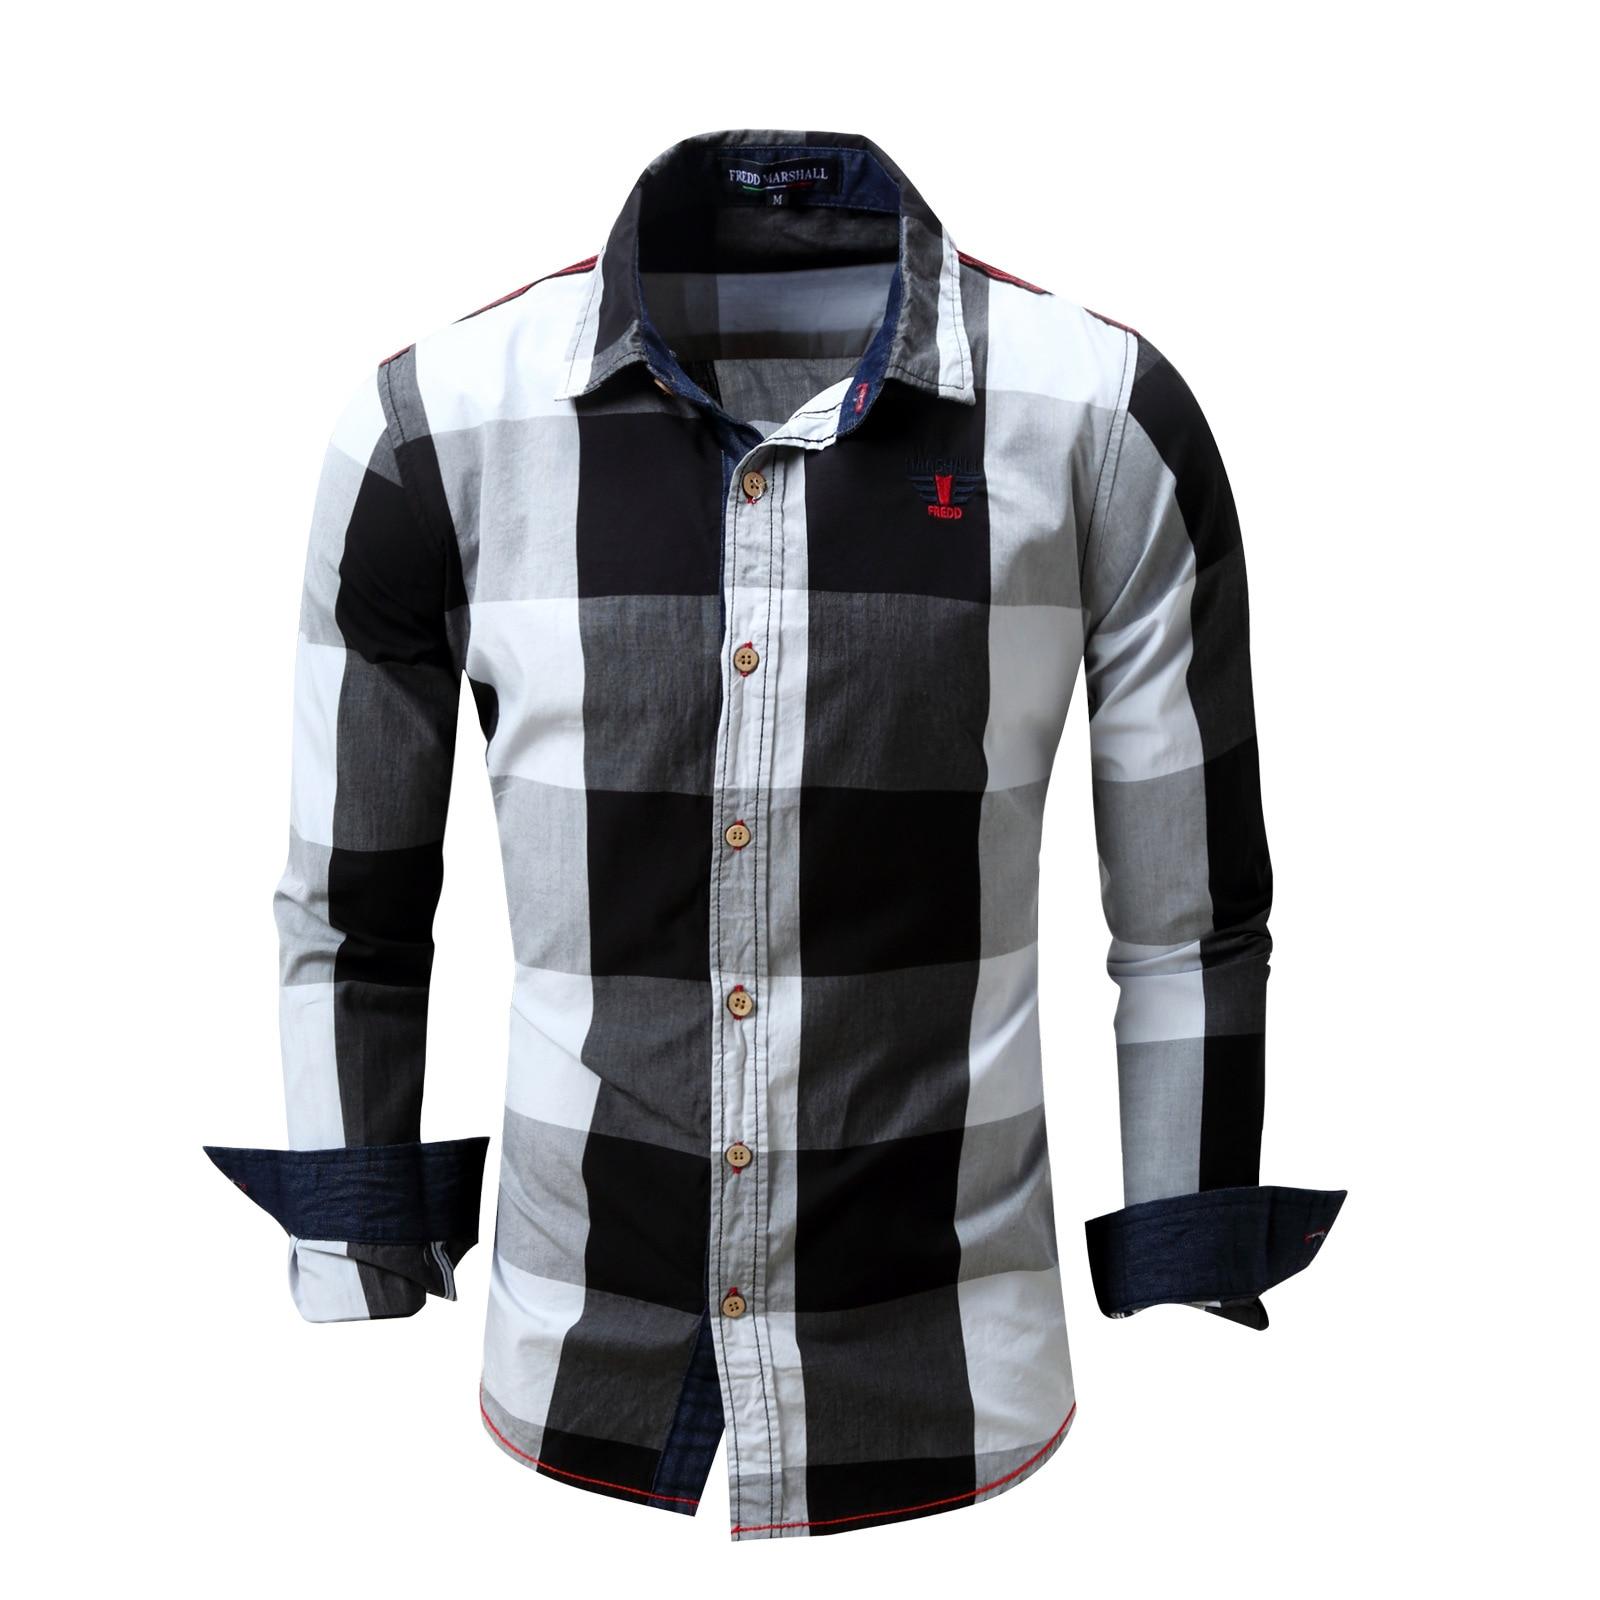 2020 New Men's Slim Fit Dress Shirts Masculina Business Long Sleeve Army Casual Turn Down Neck Shirt Autumn Denim Shirt 3XL